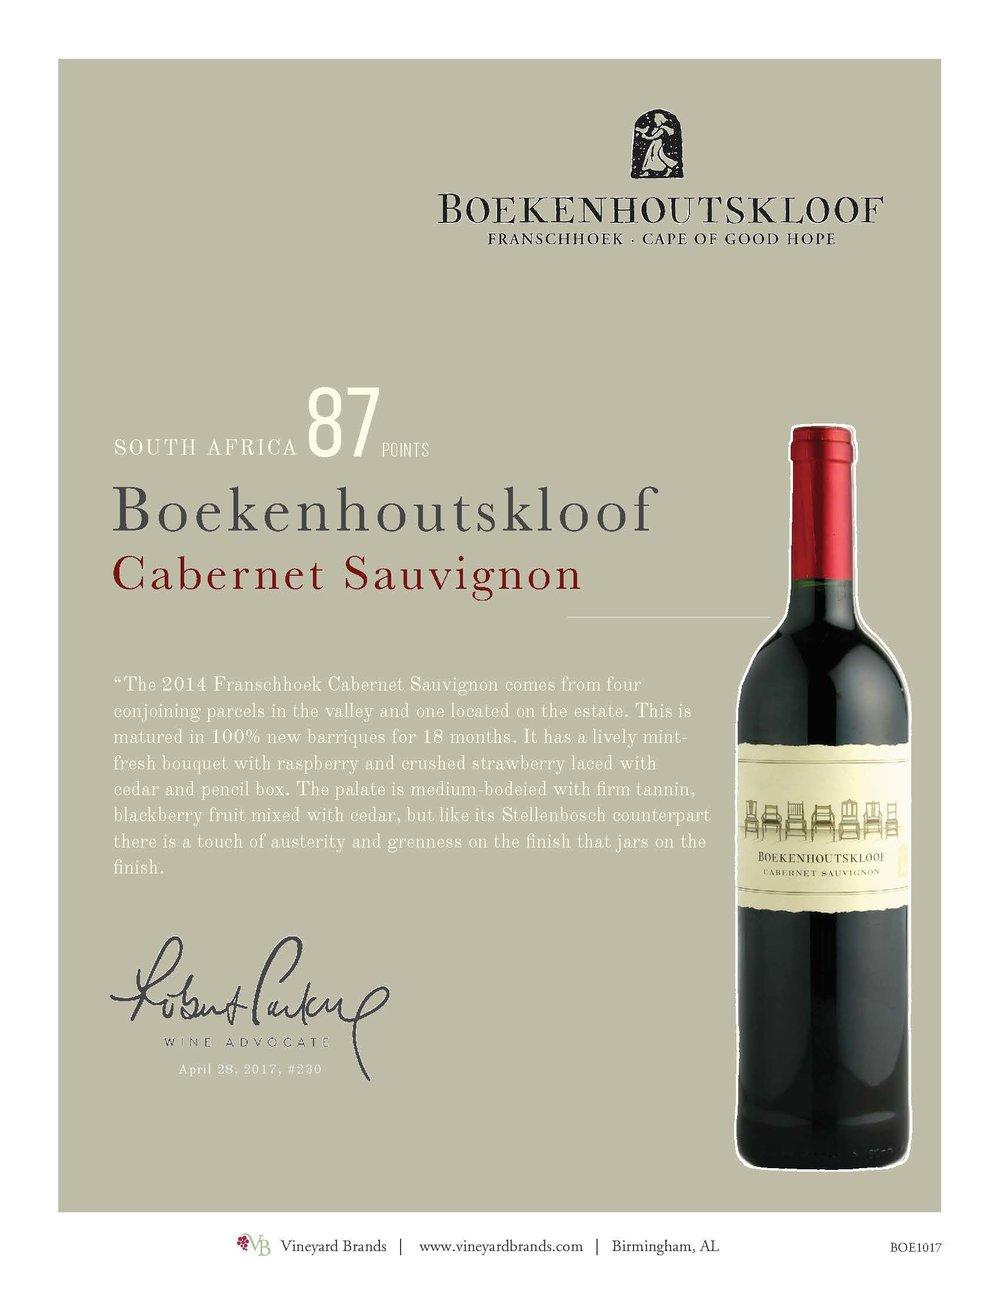 Boekenhoutskloof Cabernet Sauvignon 2014.jpg